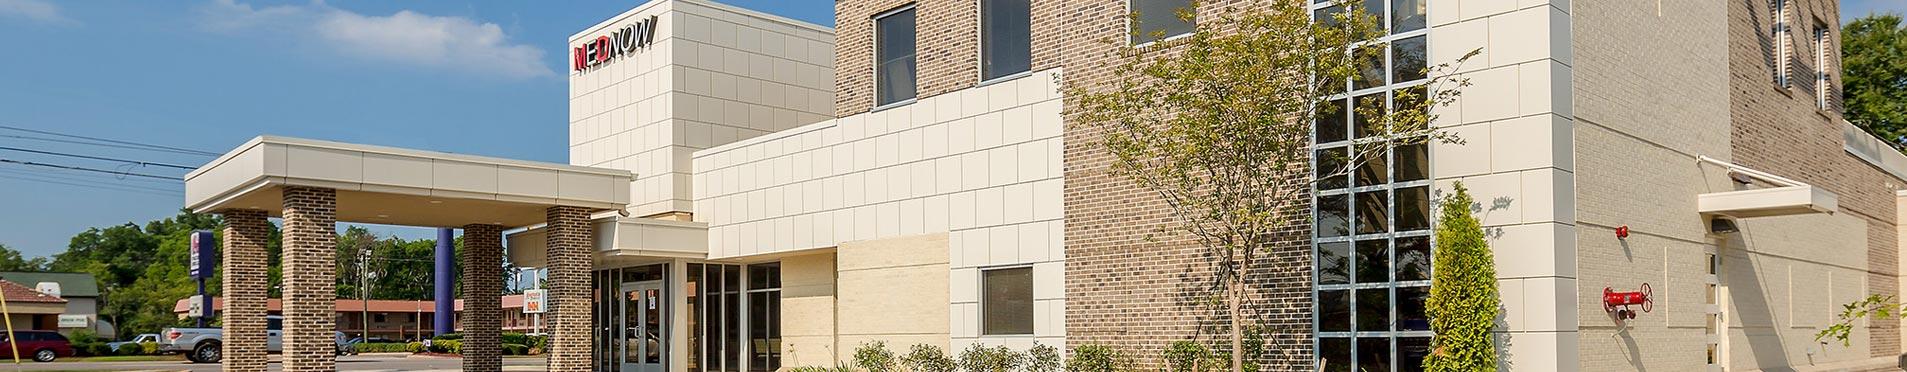 SD Clifton Projects | SD Clifton Construction